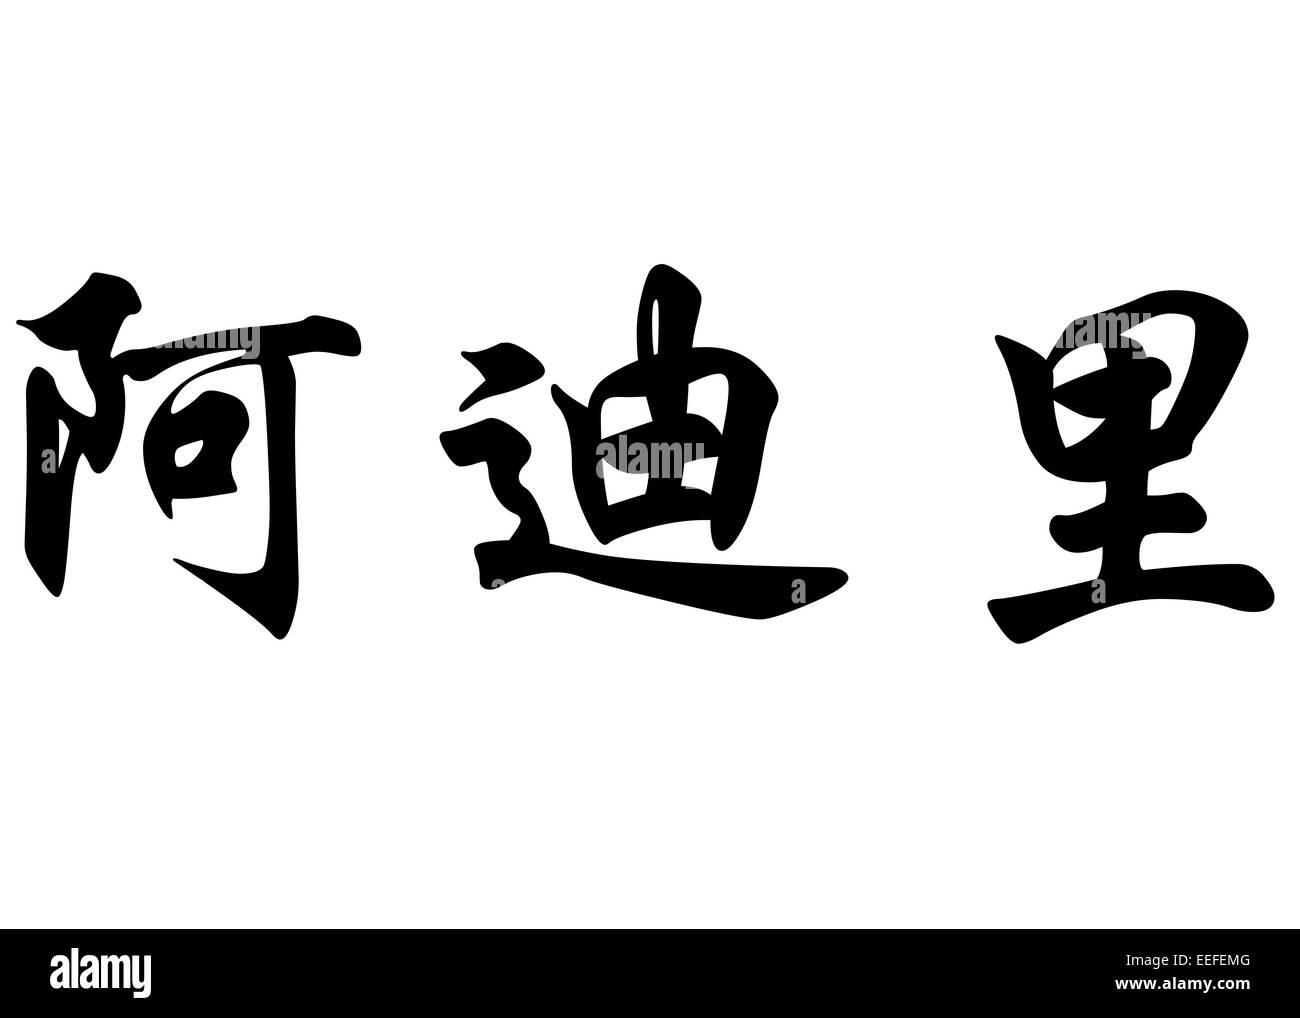 English Name Adli In Chinese Kanji Calligraphy Characters Or